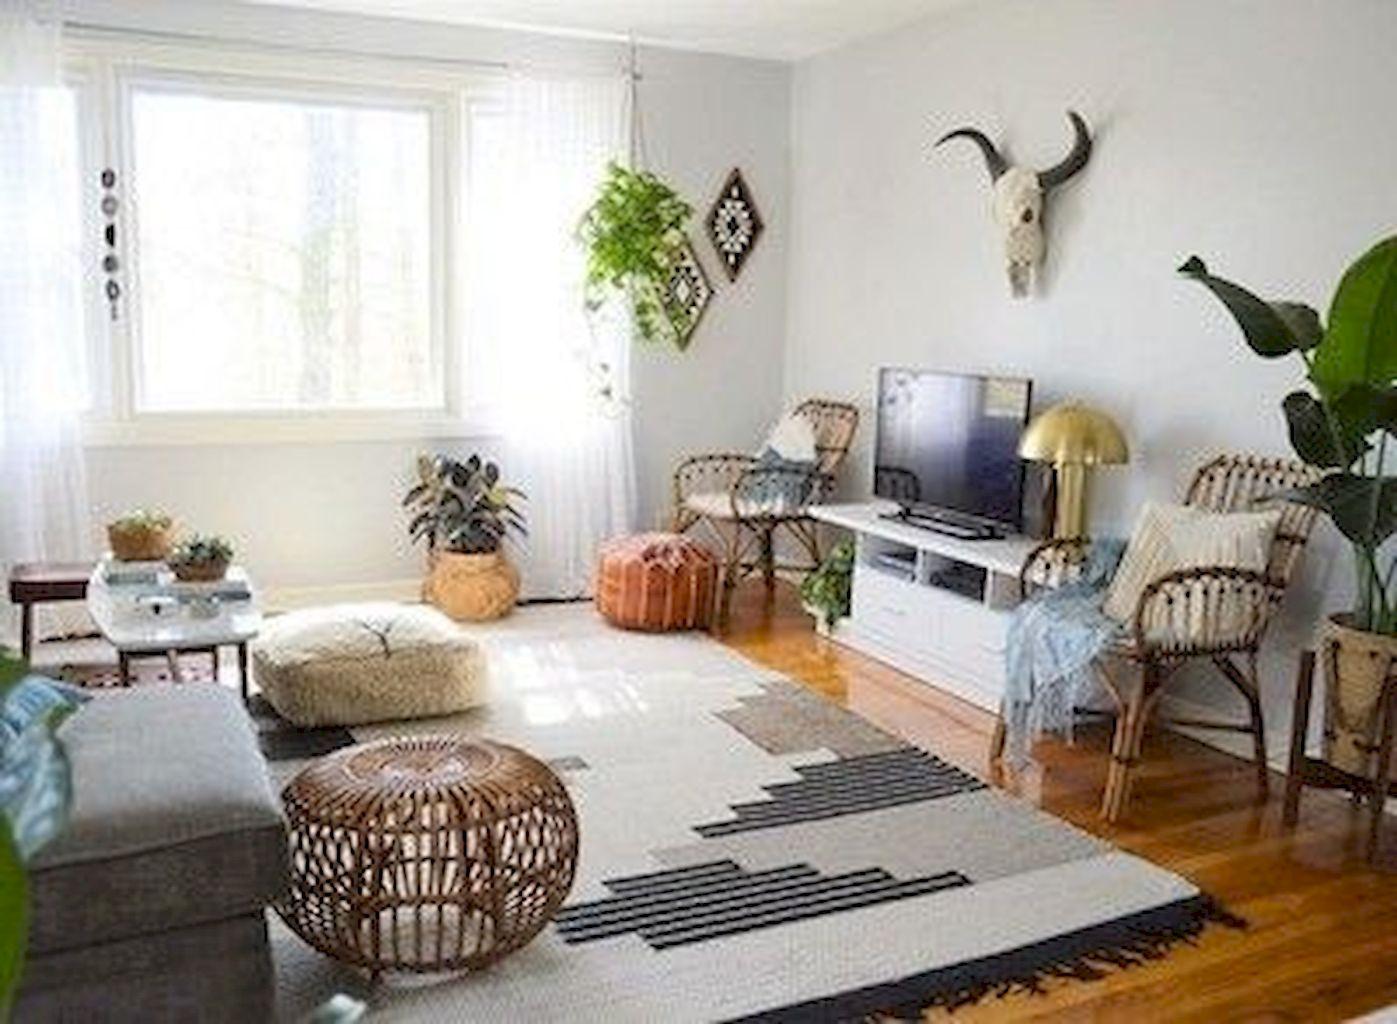 Rattan Furniture218